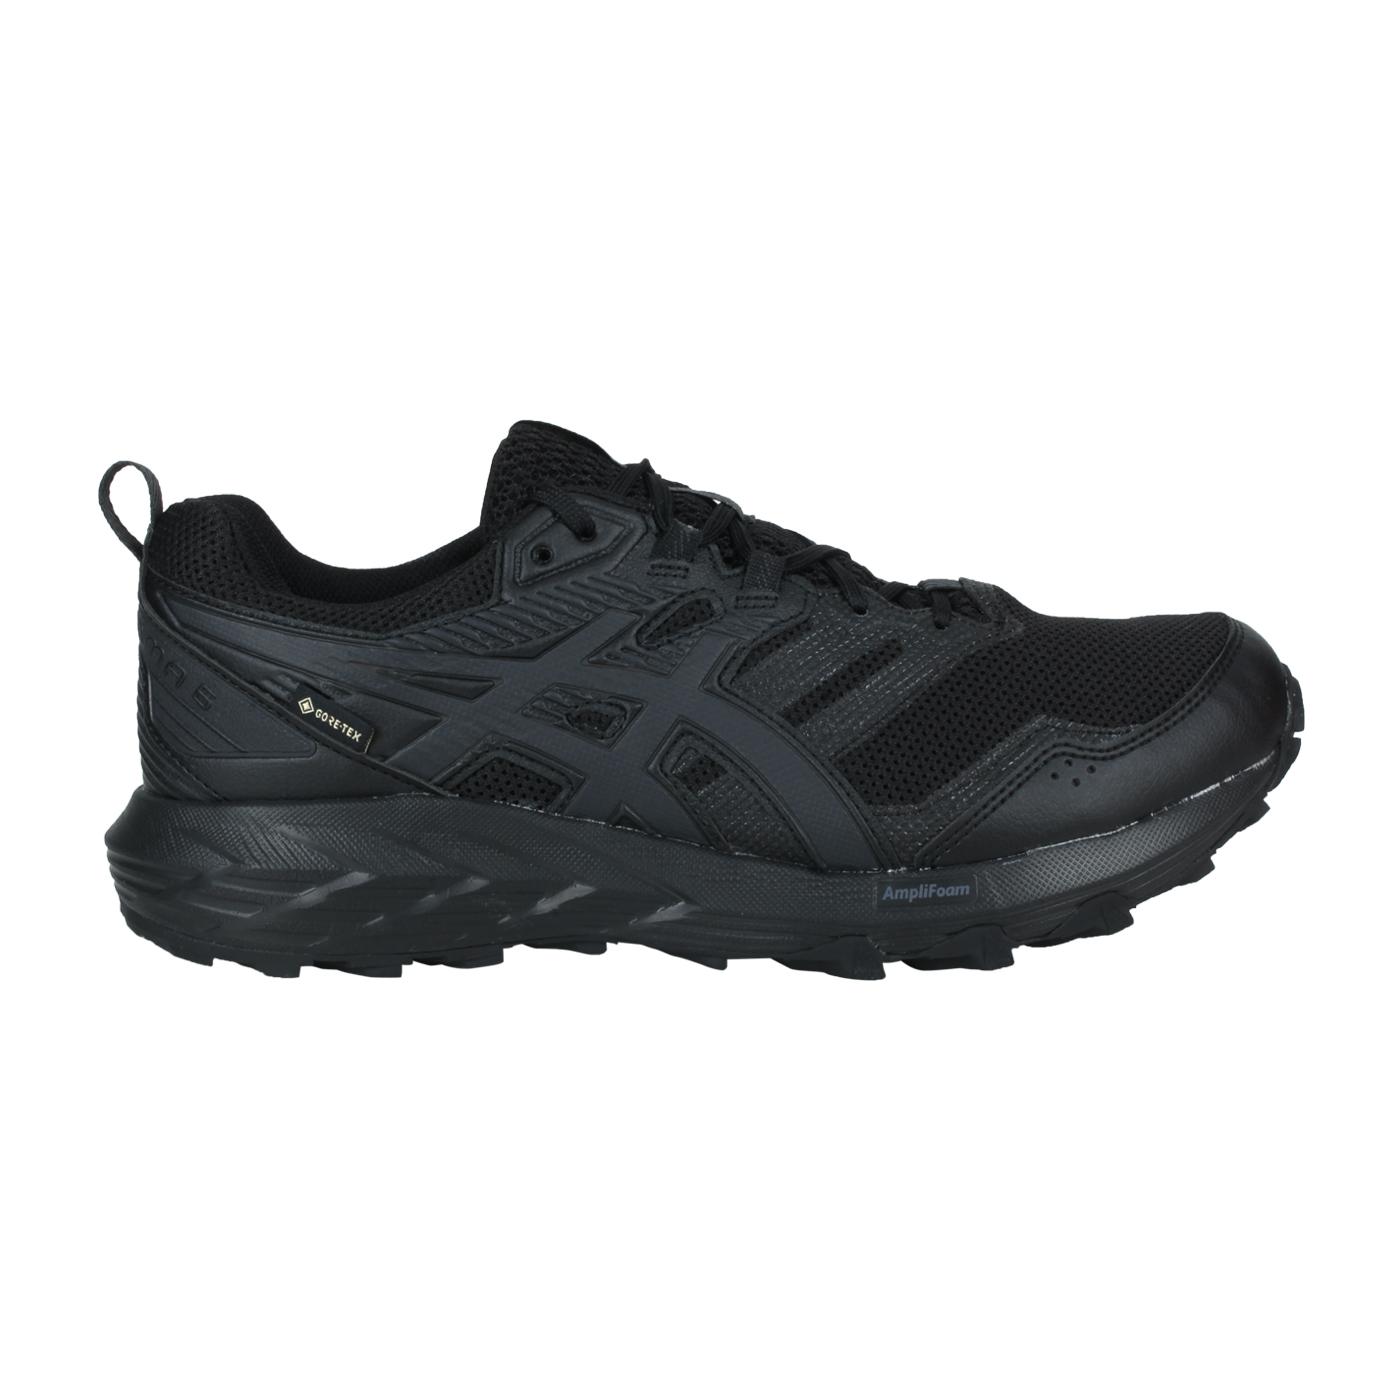 ASICS 男款慢跑鞋  @GEL-SONOMA 6 G-TX@1011B048-002 - 黑